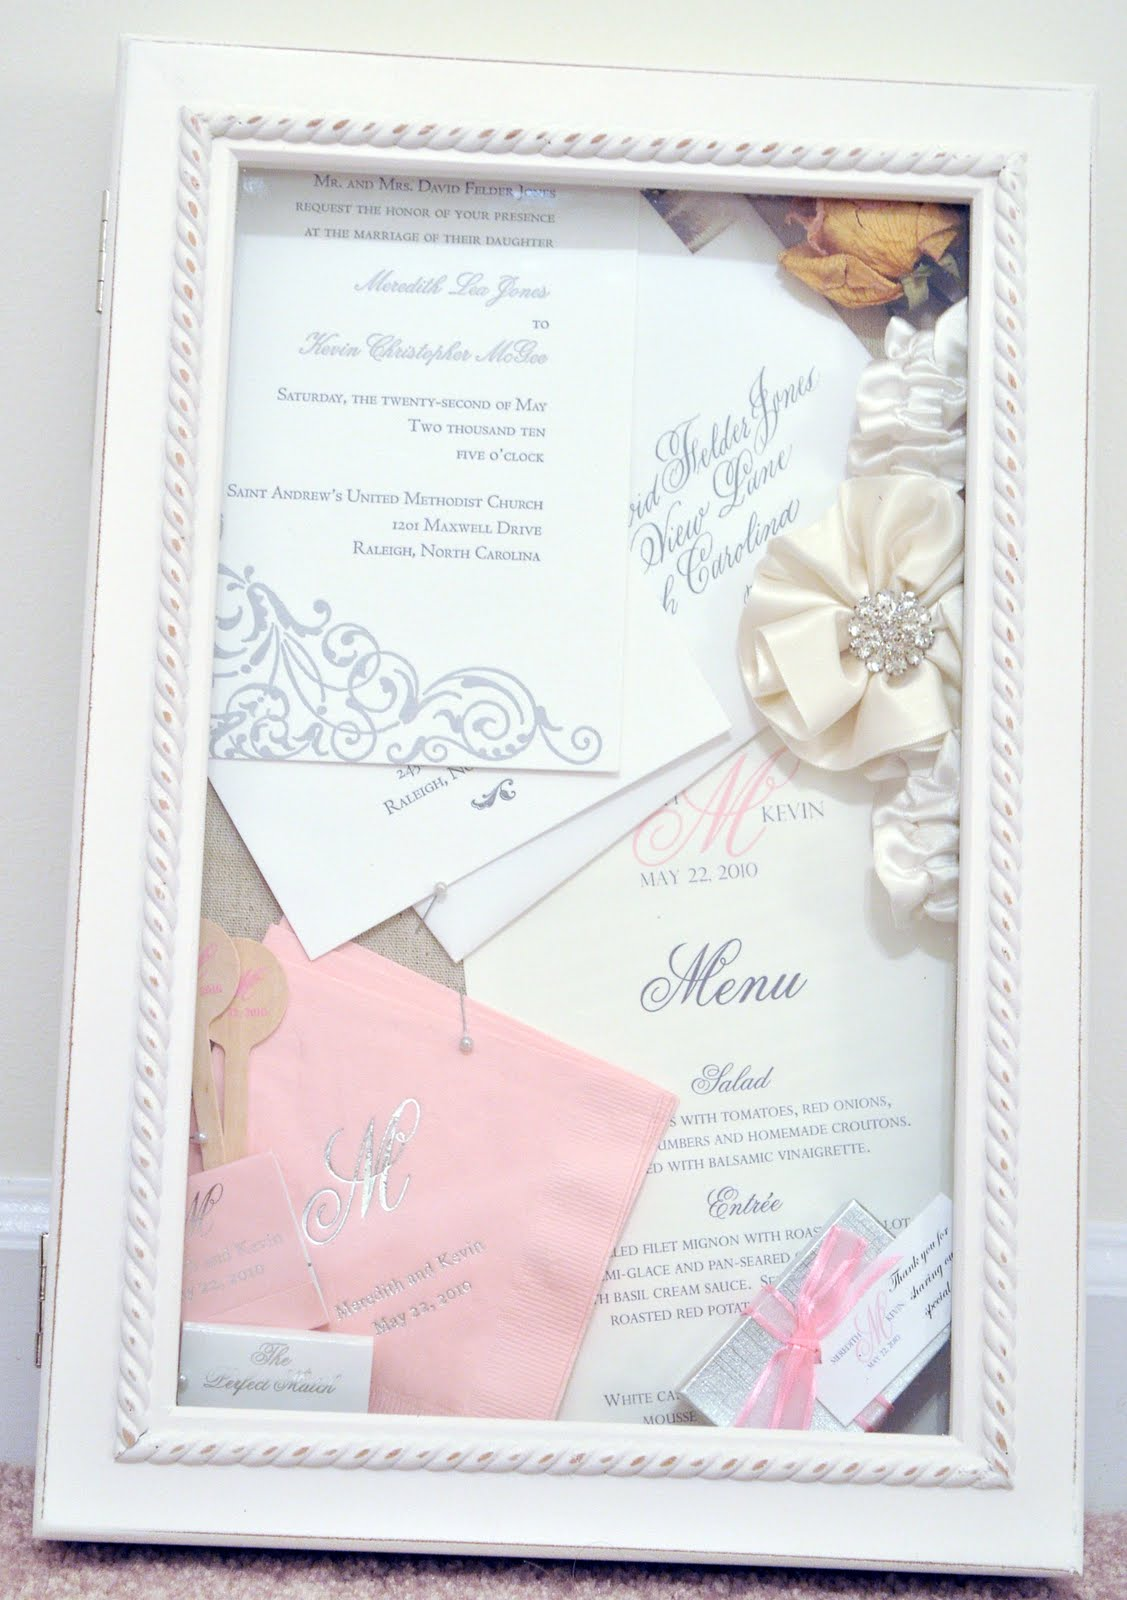 Soon to be McGee: Wedding Shadow Box